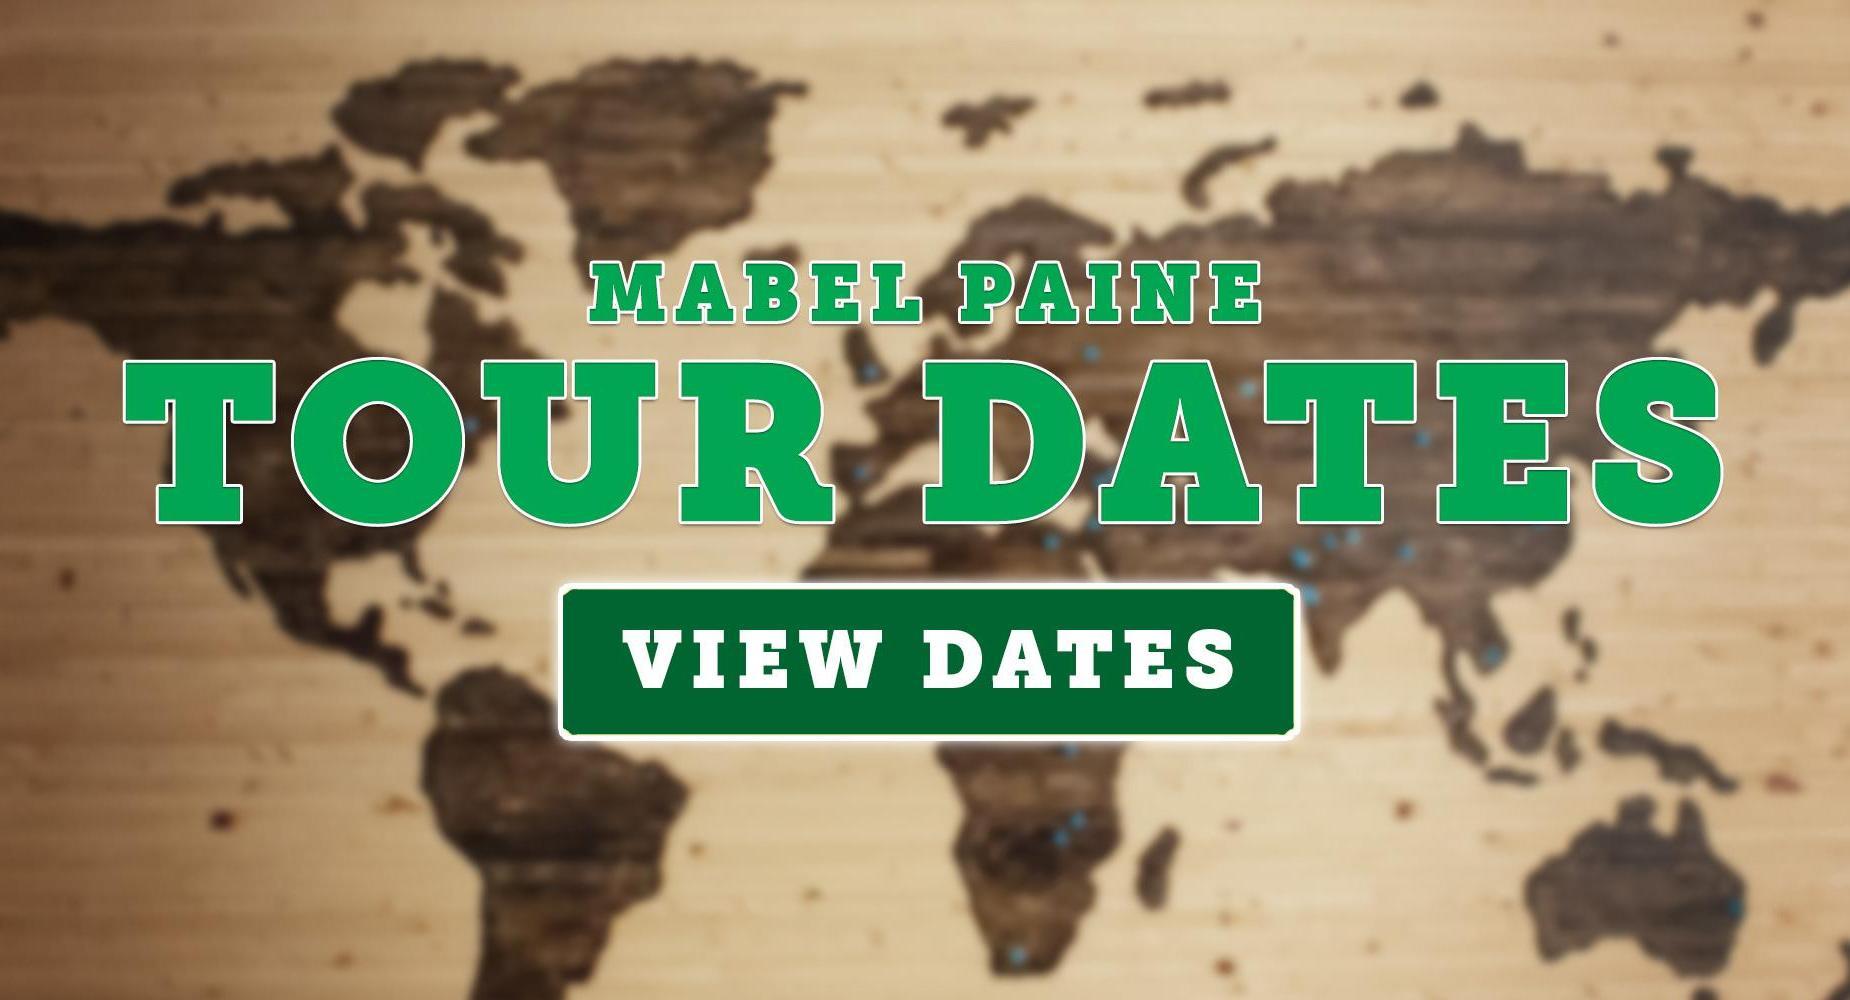 School Tour Dates